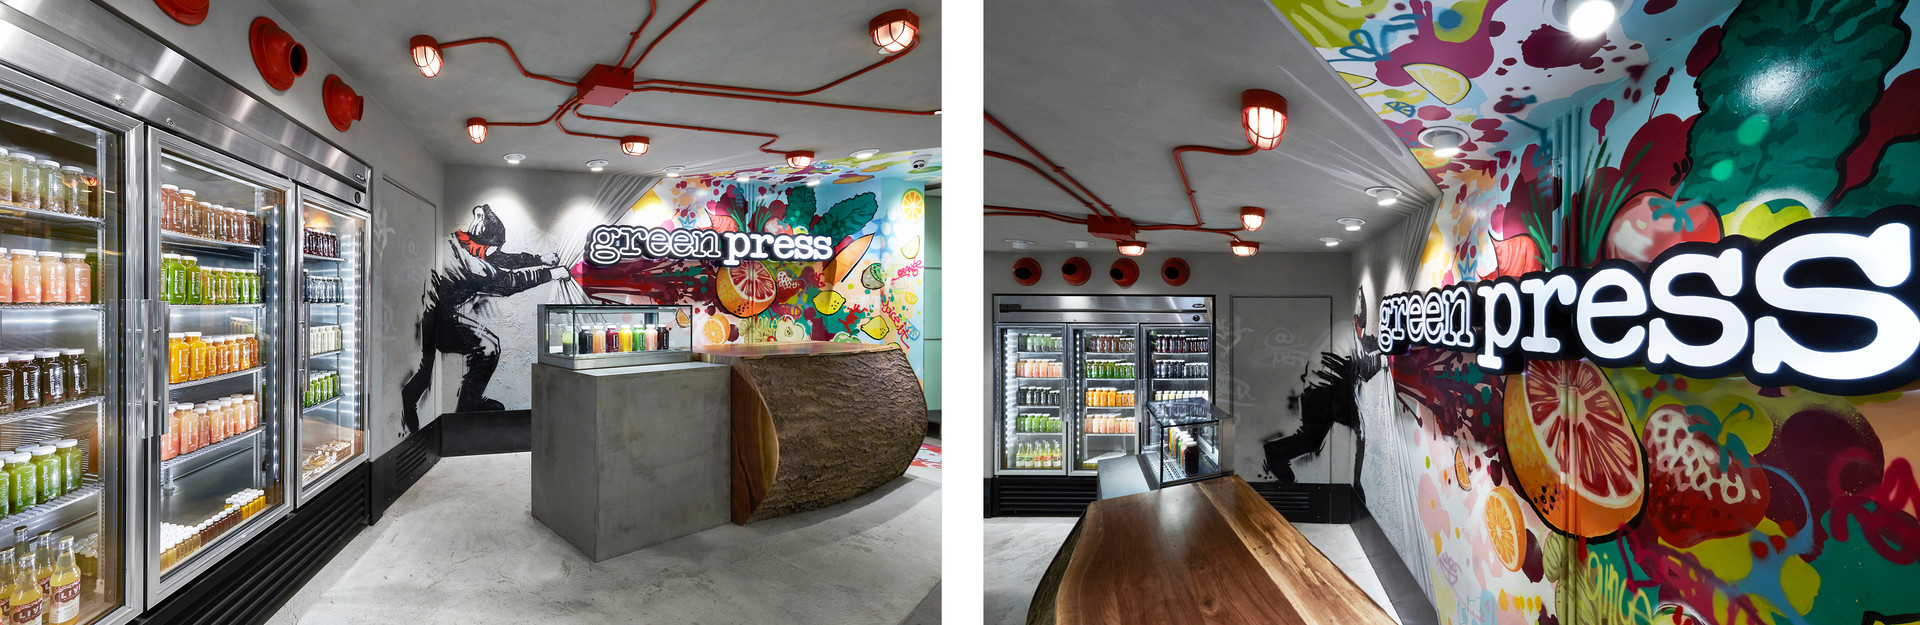 Green Press Inc.- Hudson's Bay Centre